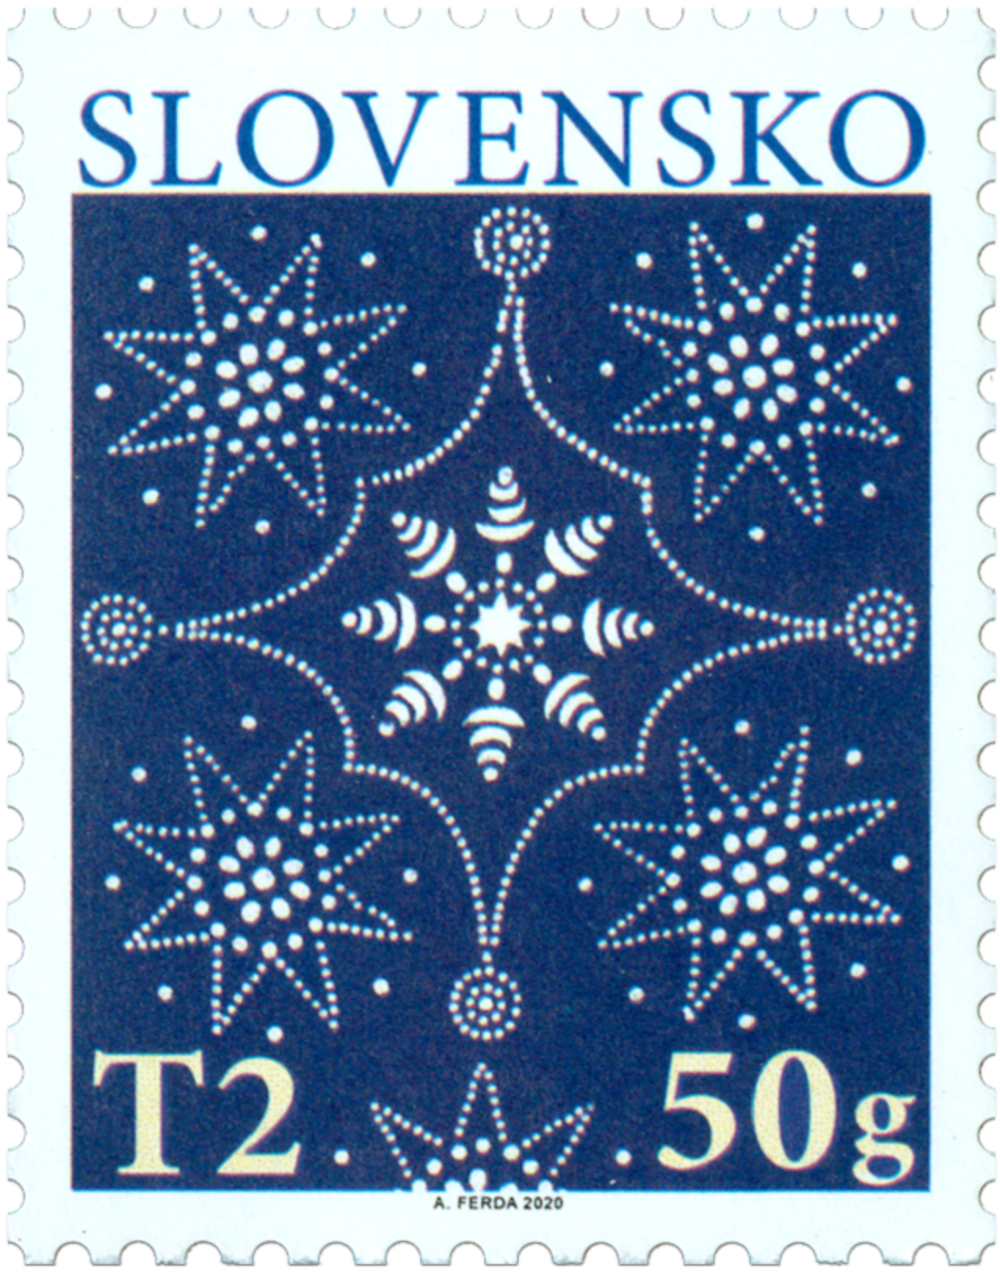 2020 Christmas stamp from Slovenská Pošta, author Adrian Ferda